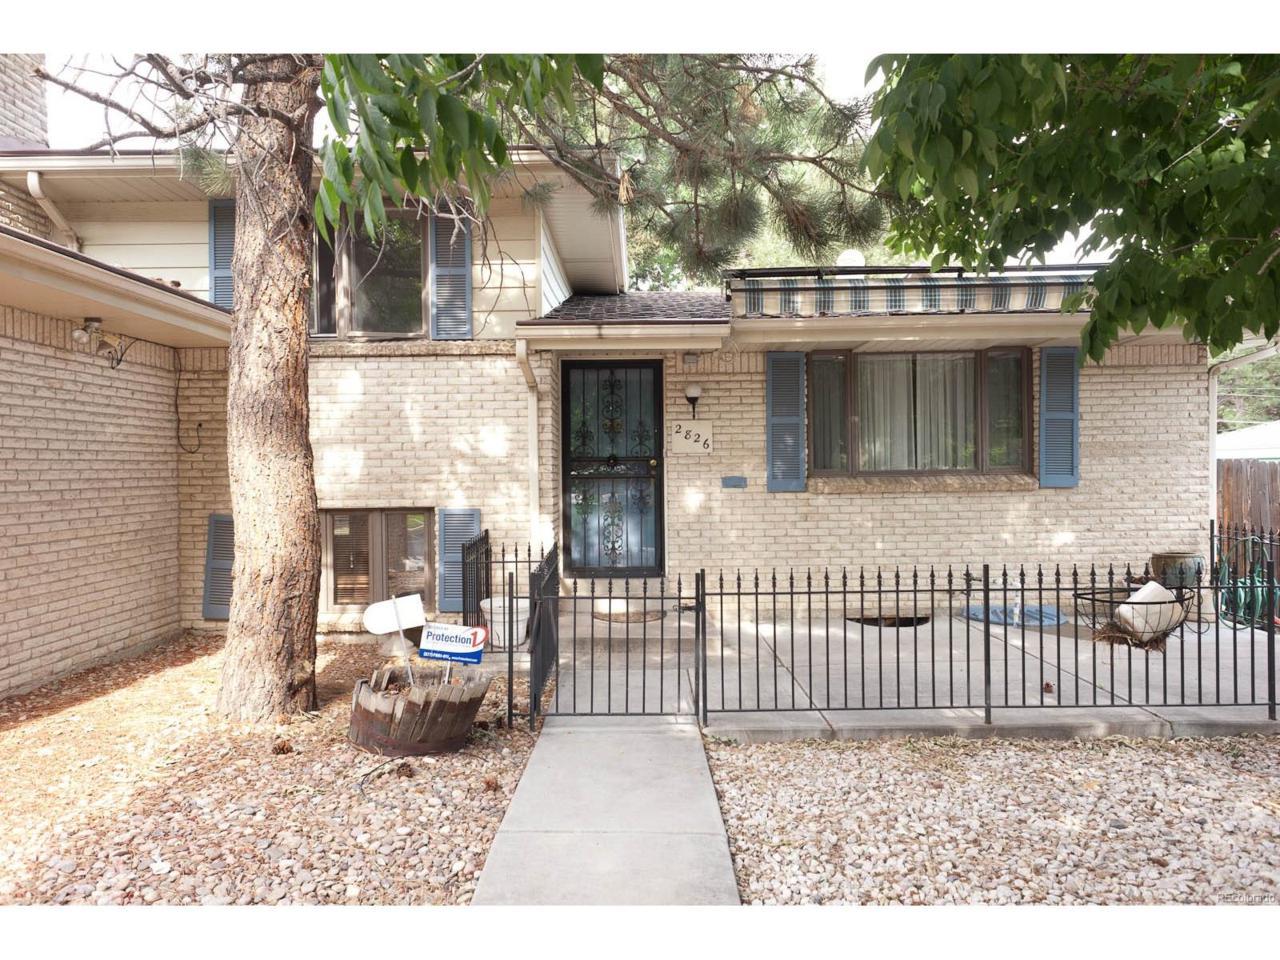 2826 S Lamar Street, Denver, CO 80227 (MLS #1867724) :: 8z Real Estate